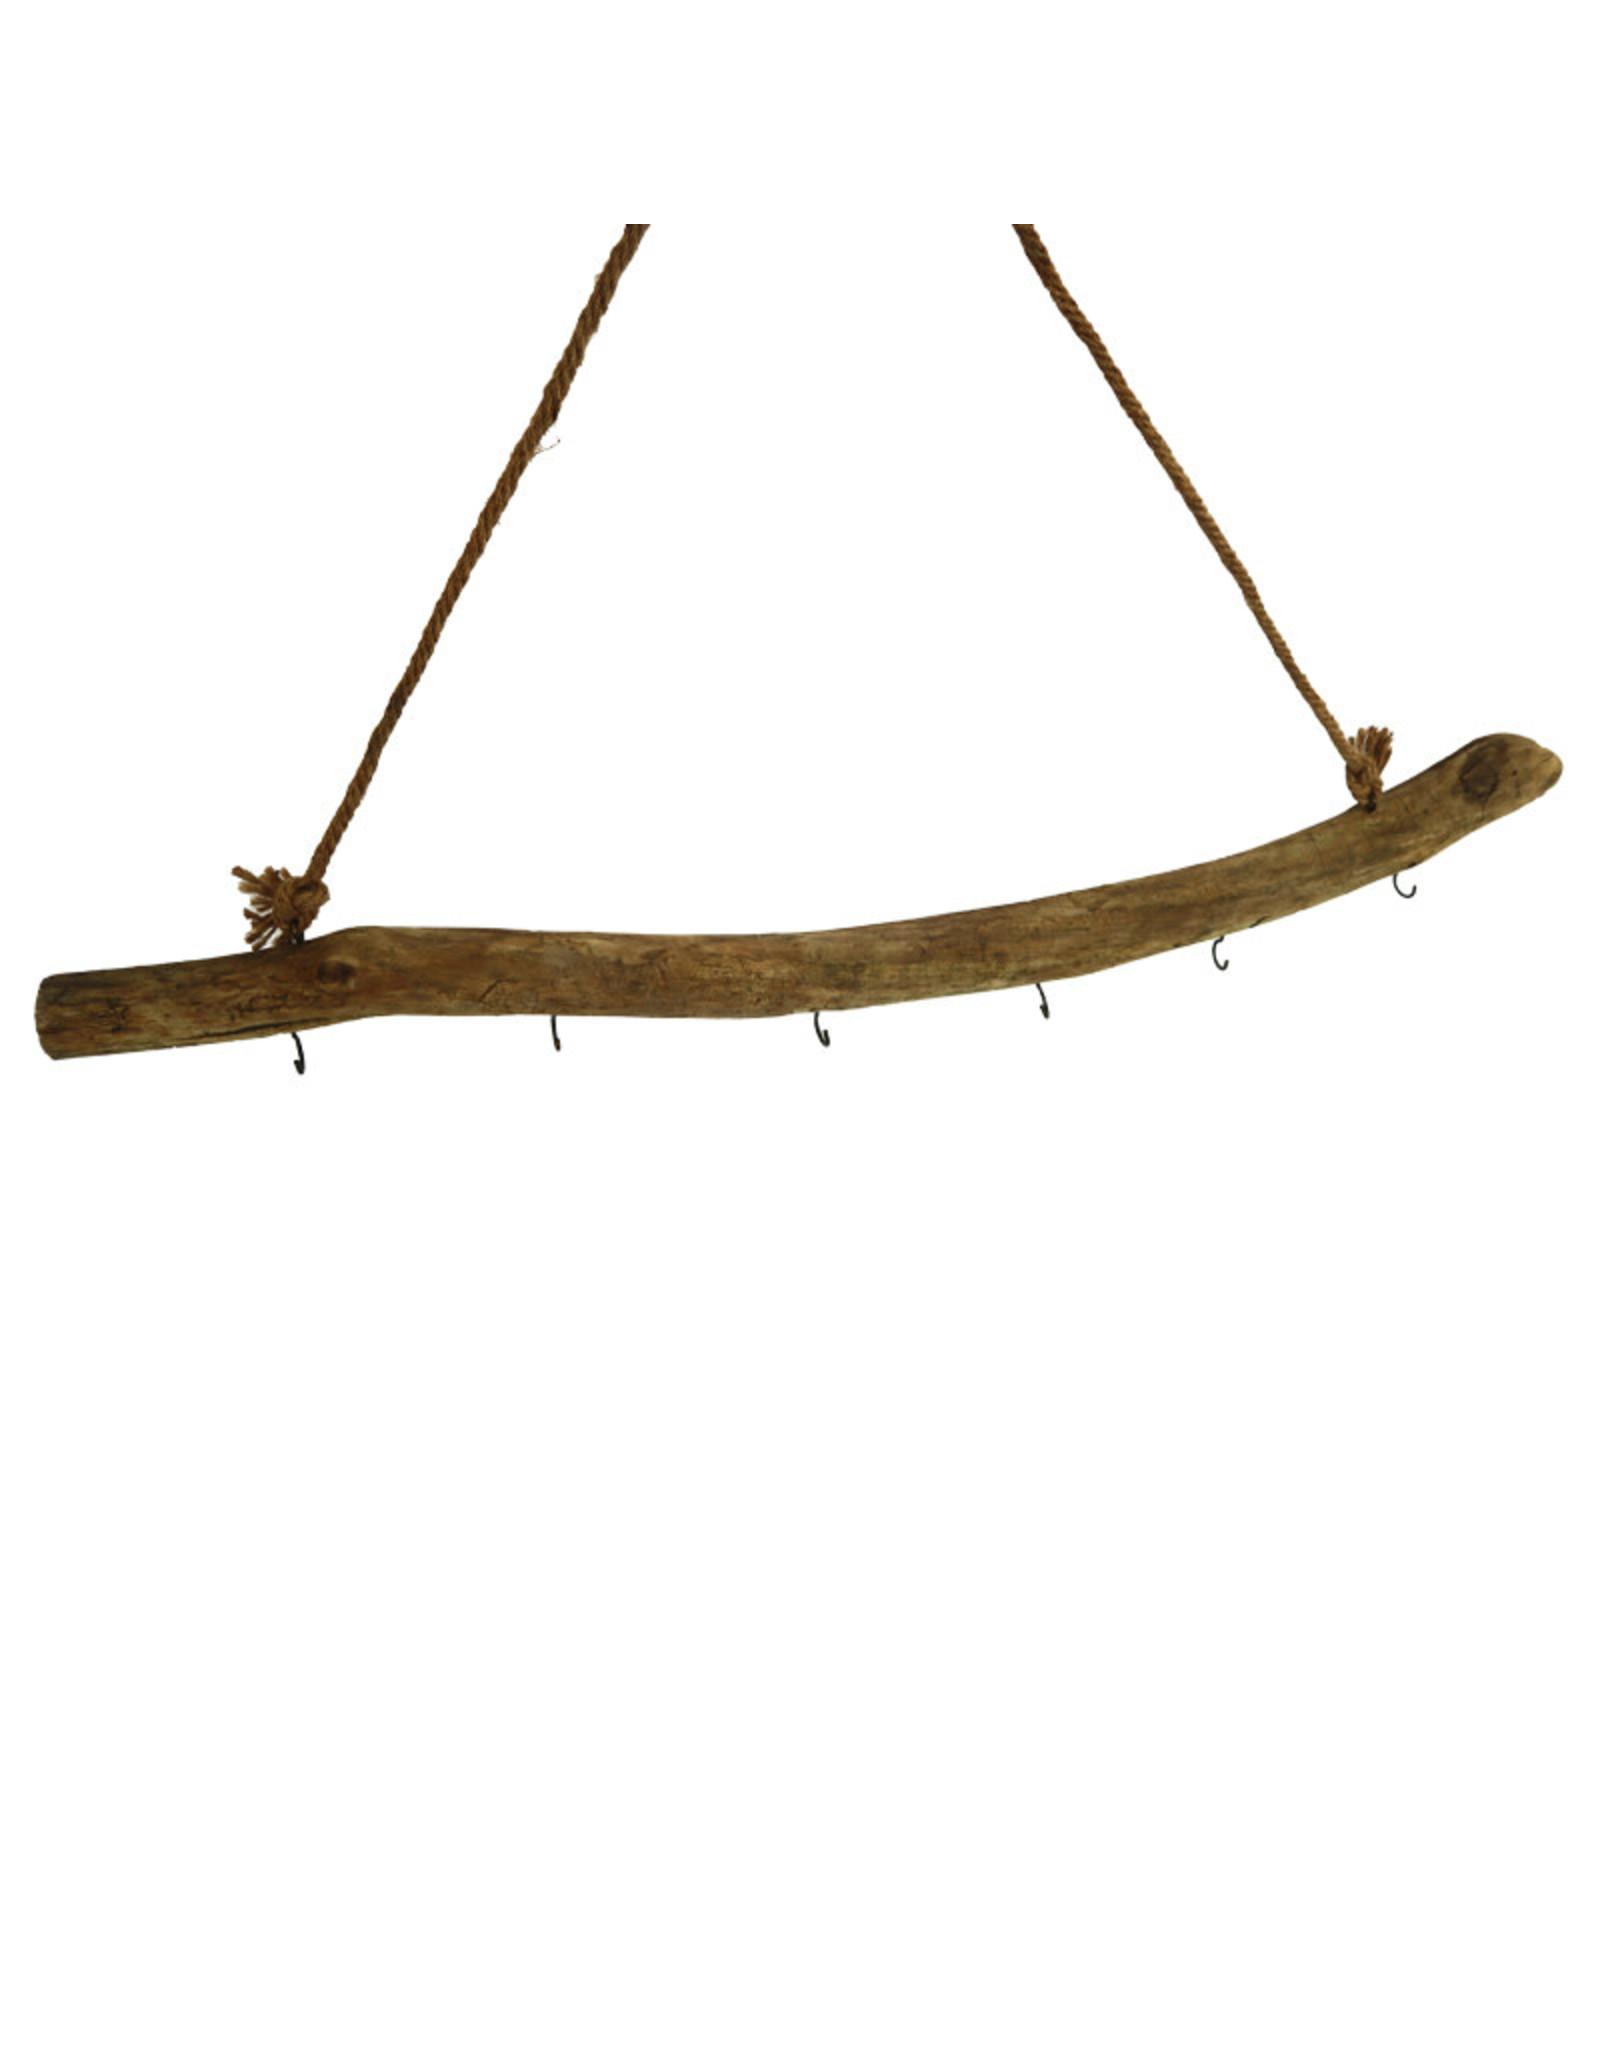 Dijk Historic Wood Stick Hanger with 6 Hooks 78x40cm